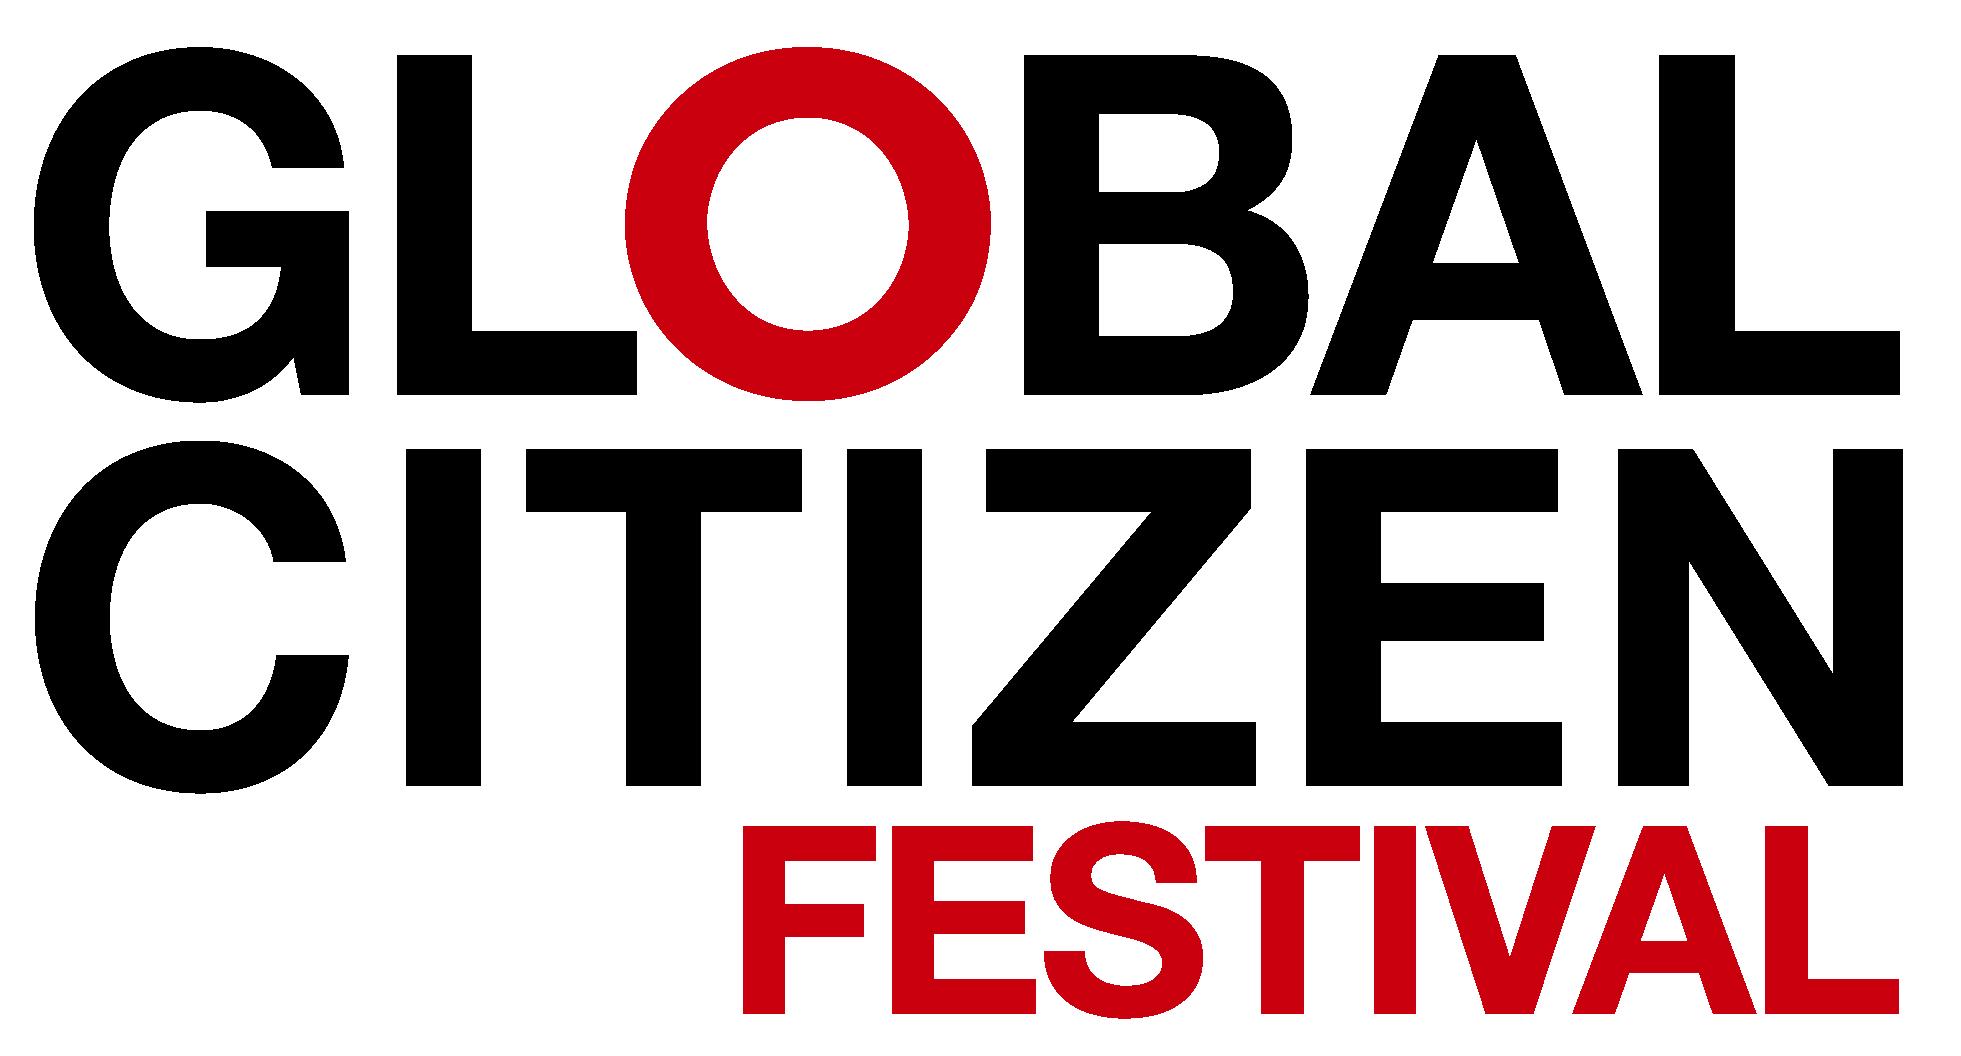 globalcitizenfestivallogo_9712_final-02.png